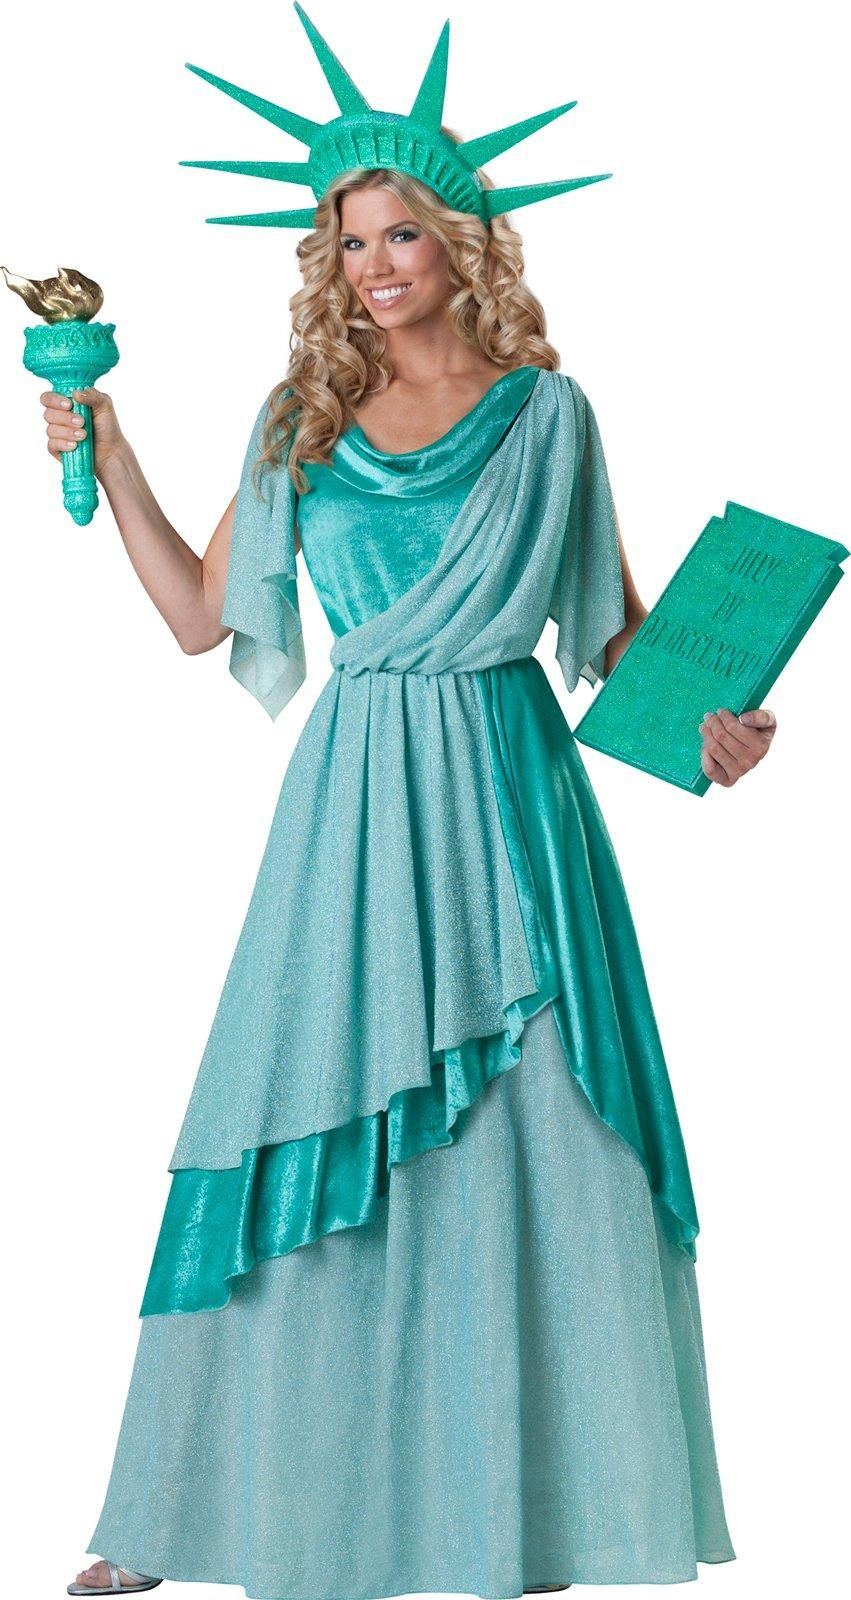 CA703 Miss Lady Liberty Costume Kit Patriotic Statue America Shirt Torch Crown